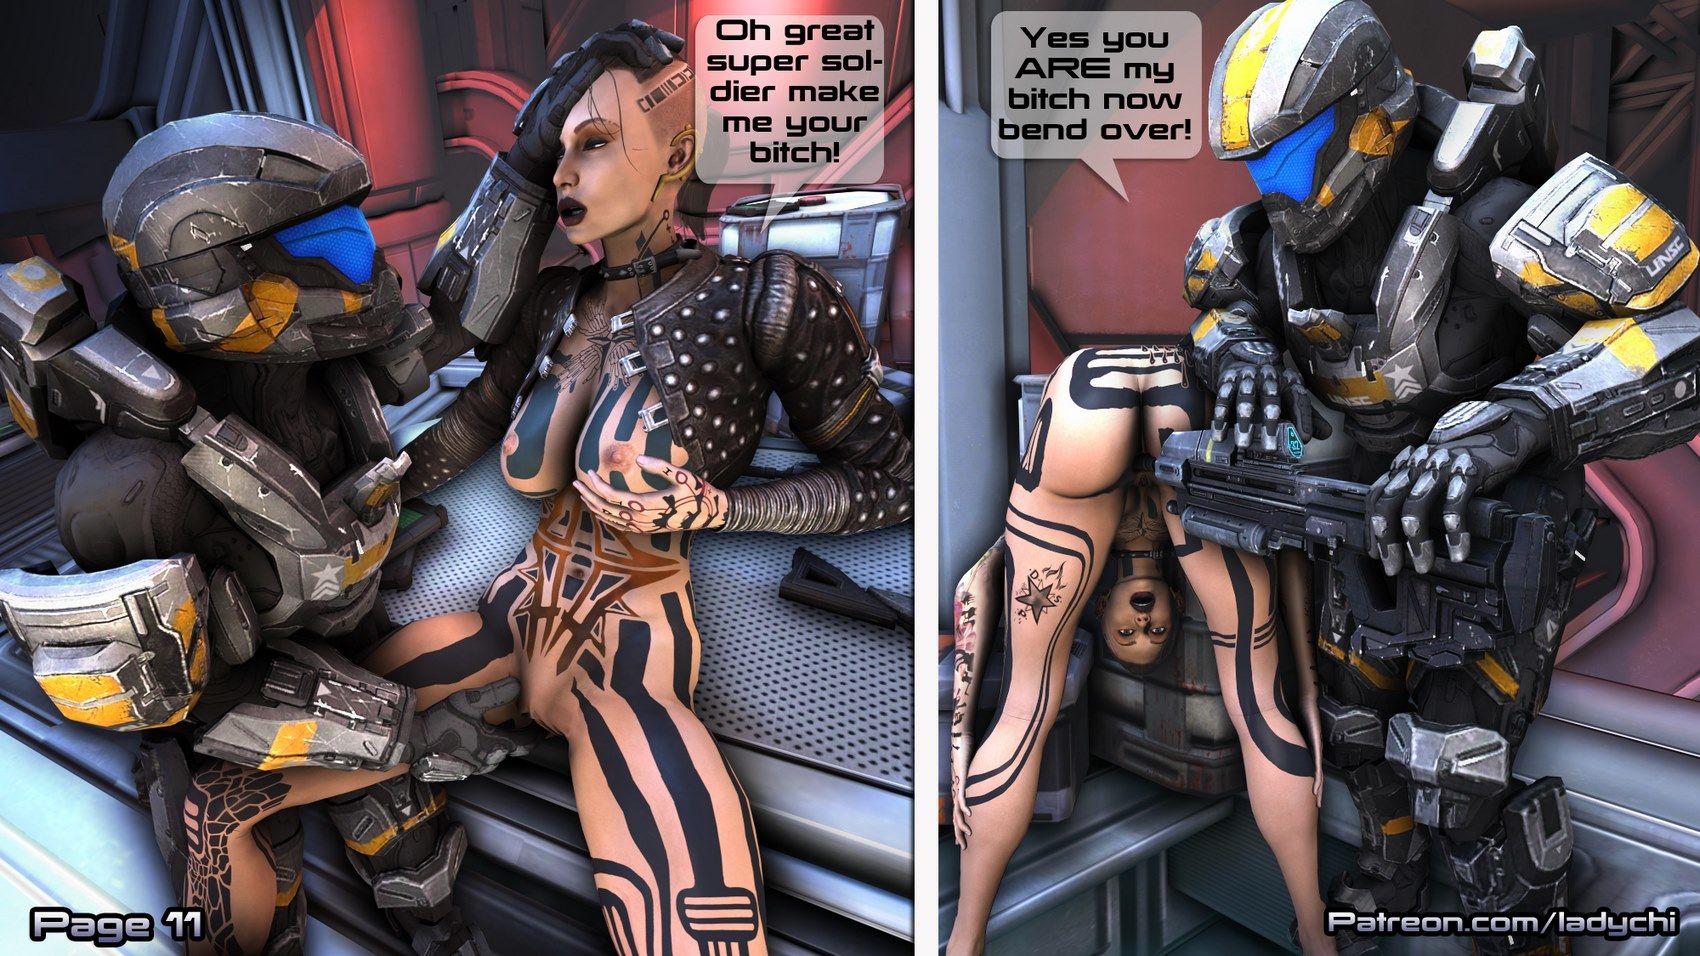 Jacks_Dream_Ladychi_(Mass_Effect) comix_57851.jpg